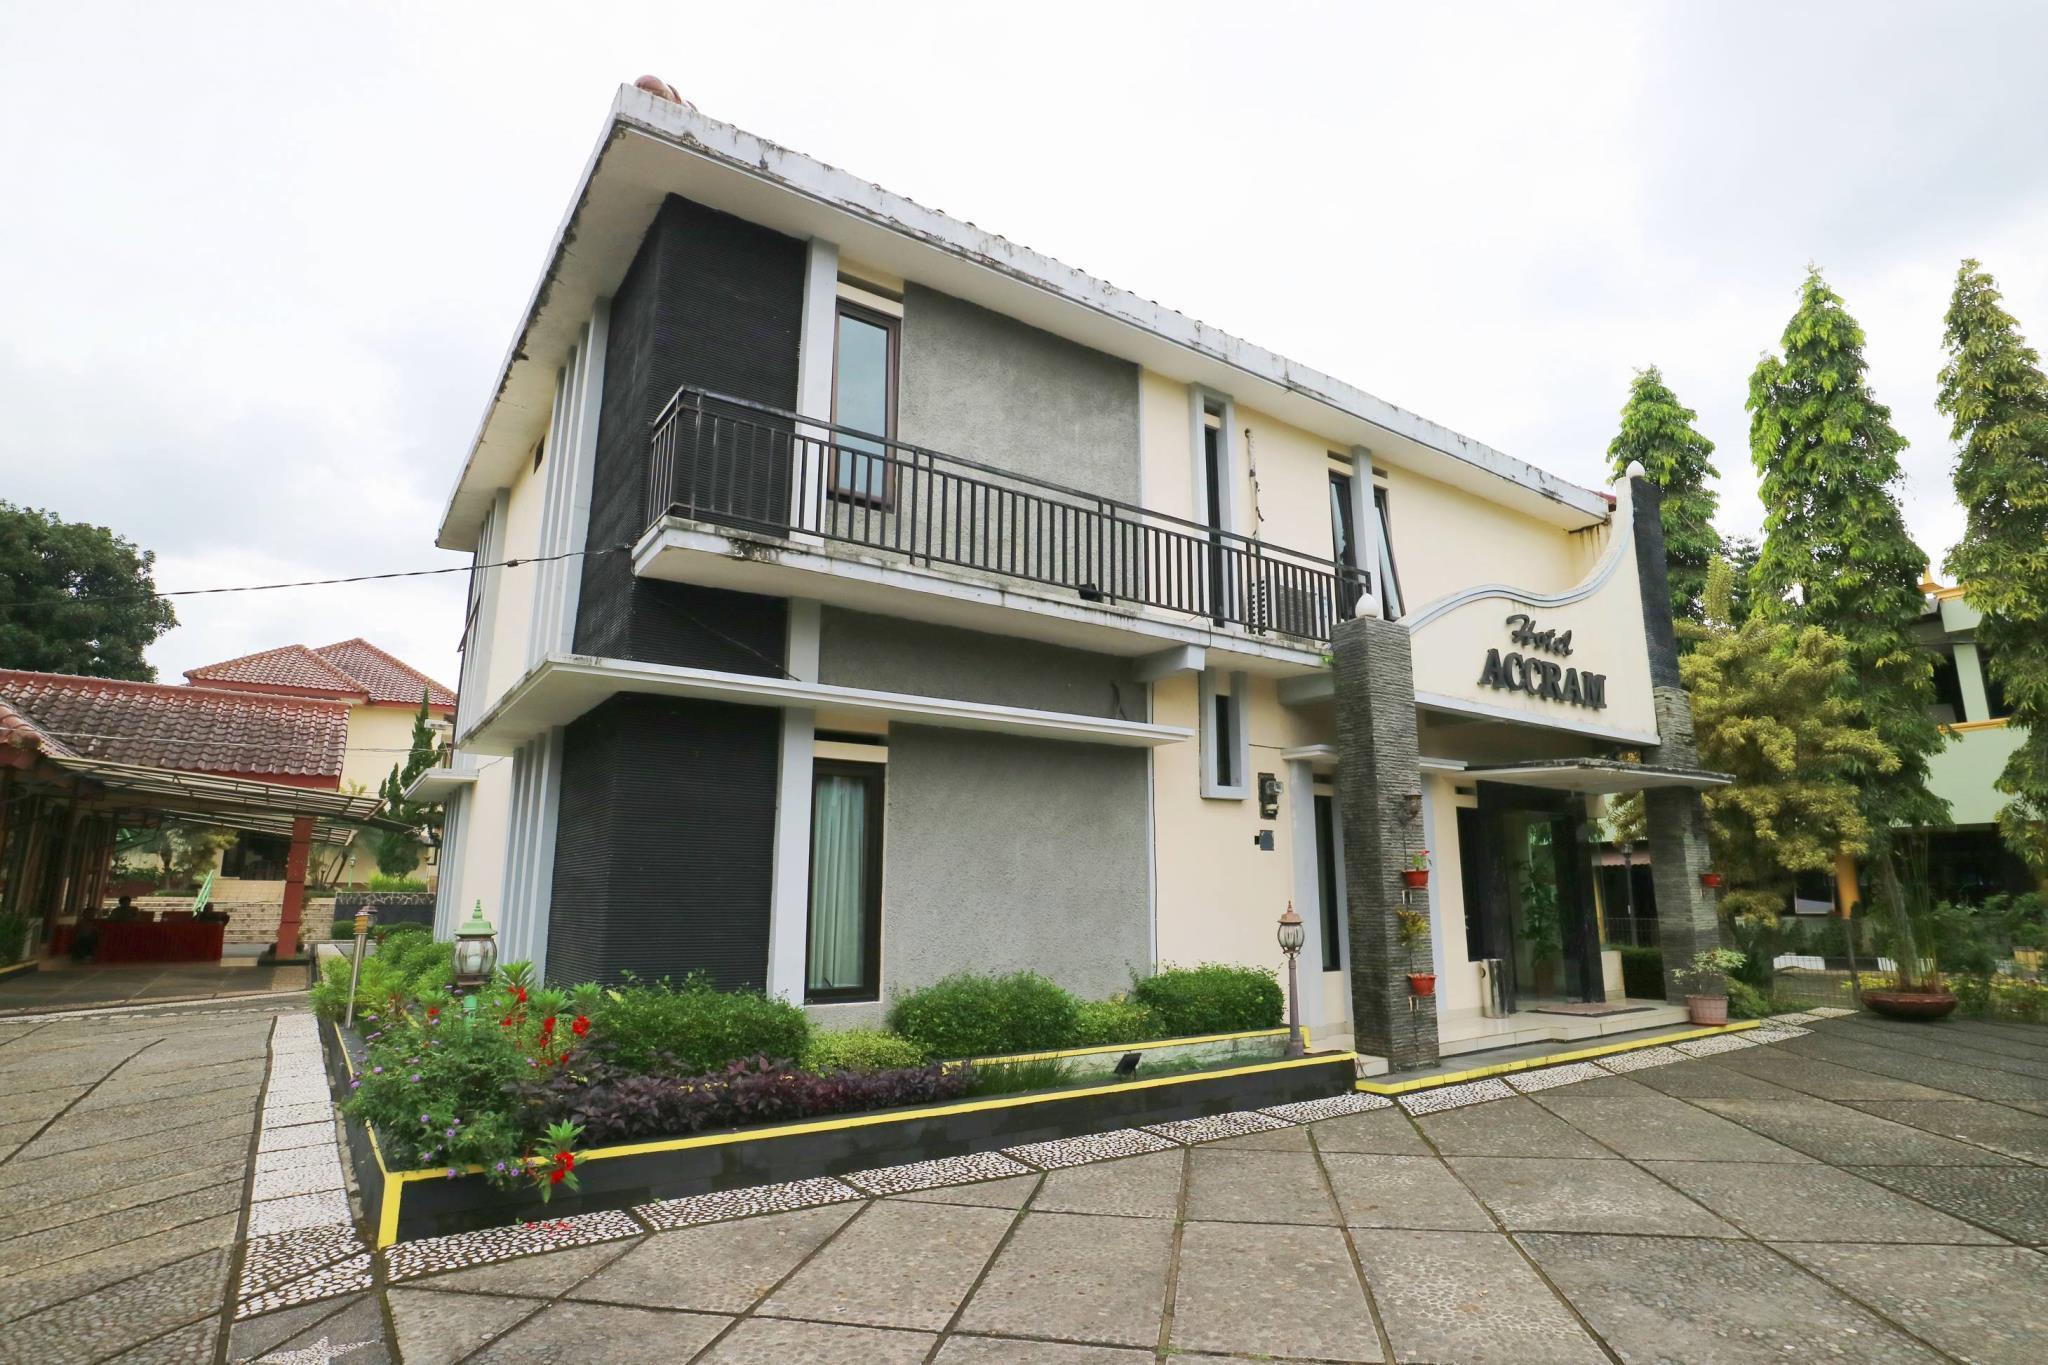 Hotel Accram